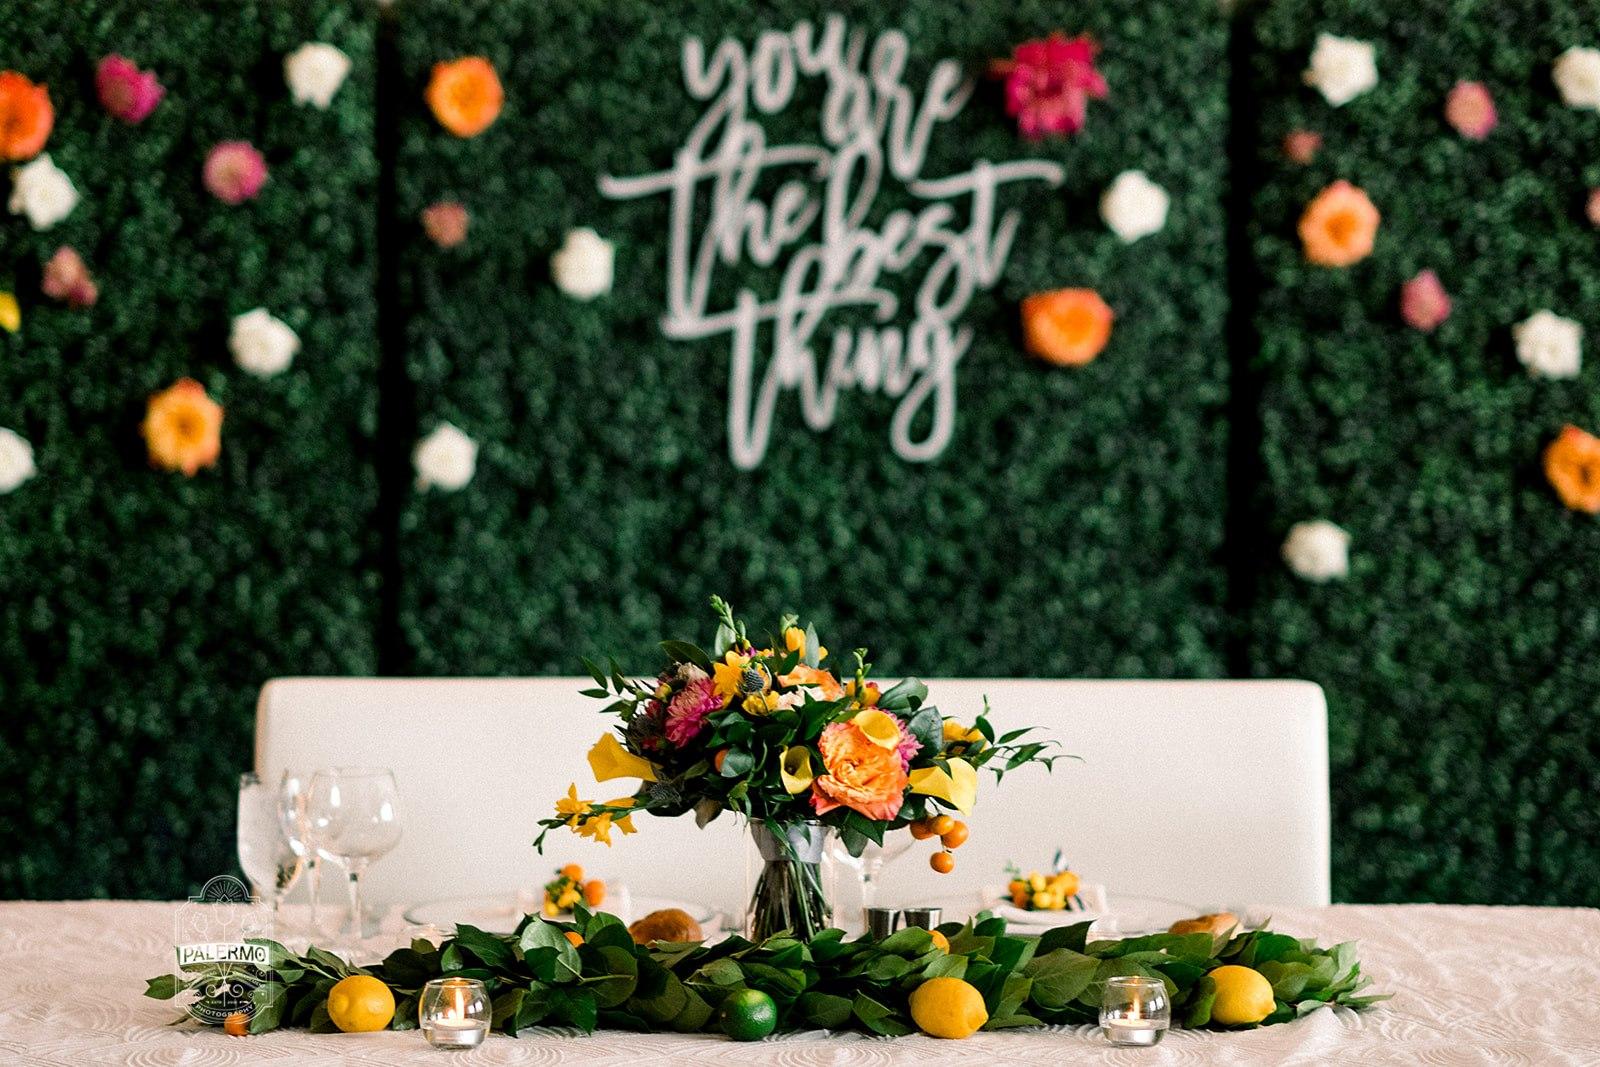 wedding head table boxwood hedges backdrop greenery garland citrus bridal bouquet summer wedding garden party